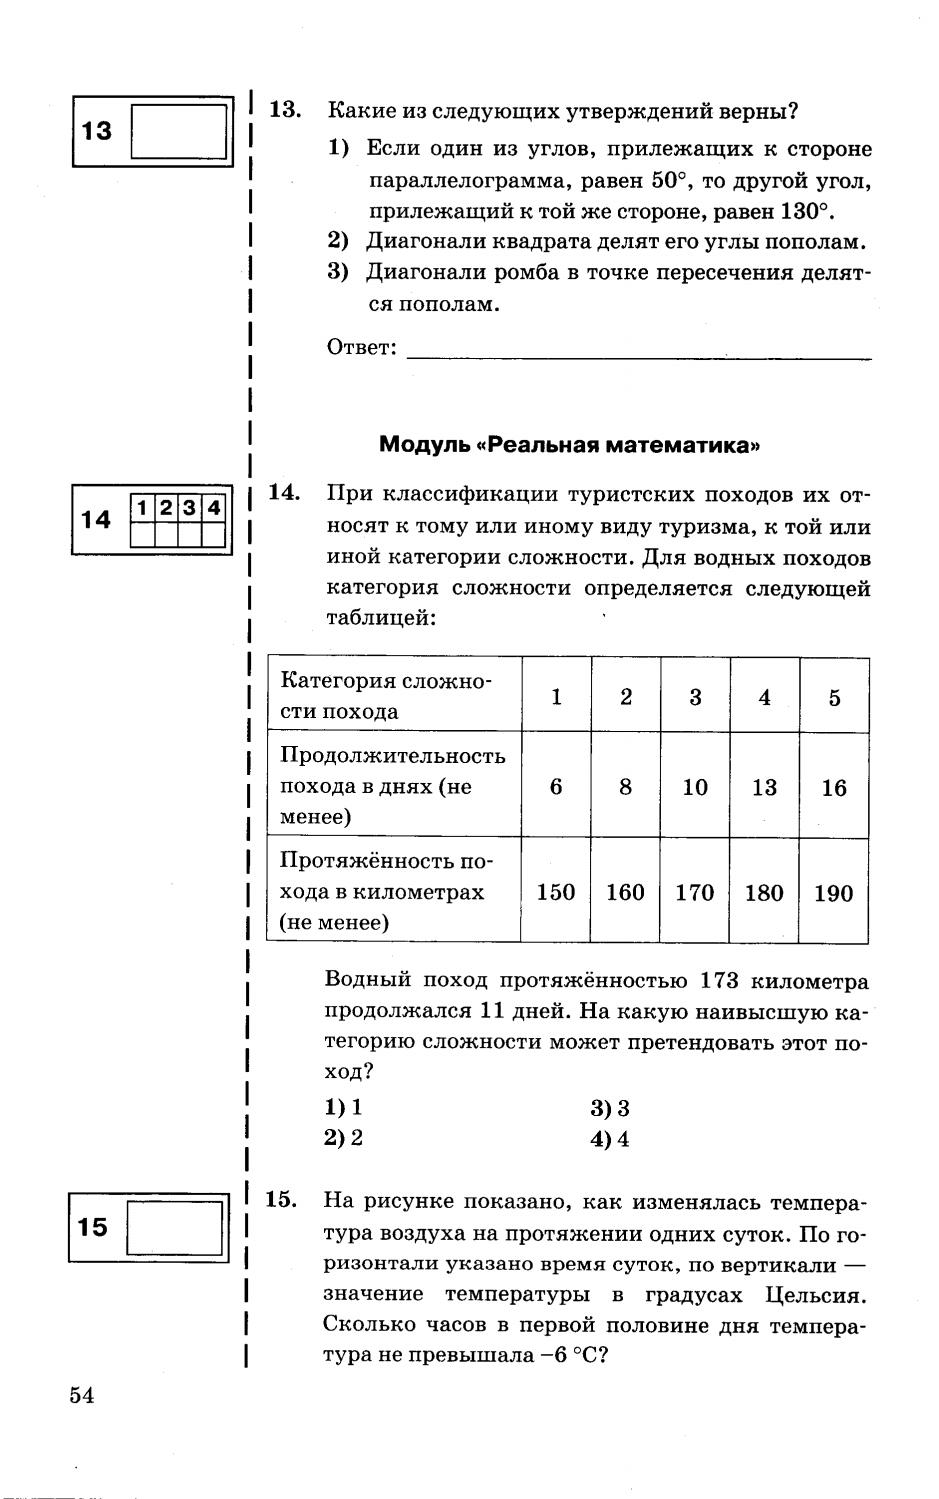 https://docs.google.com/viewer?pid=explorer&srcid=0Bw_f54pvrxEtbldKNGgyaFE3TDg&chrome=false&docid=e803bf4555b2fe7a8e01072ad16bc93b%7Cc9acad21277b9c8c76d1236b5bcea6e2&a=bi&pagenumber=55&w=939